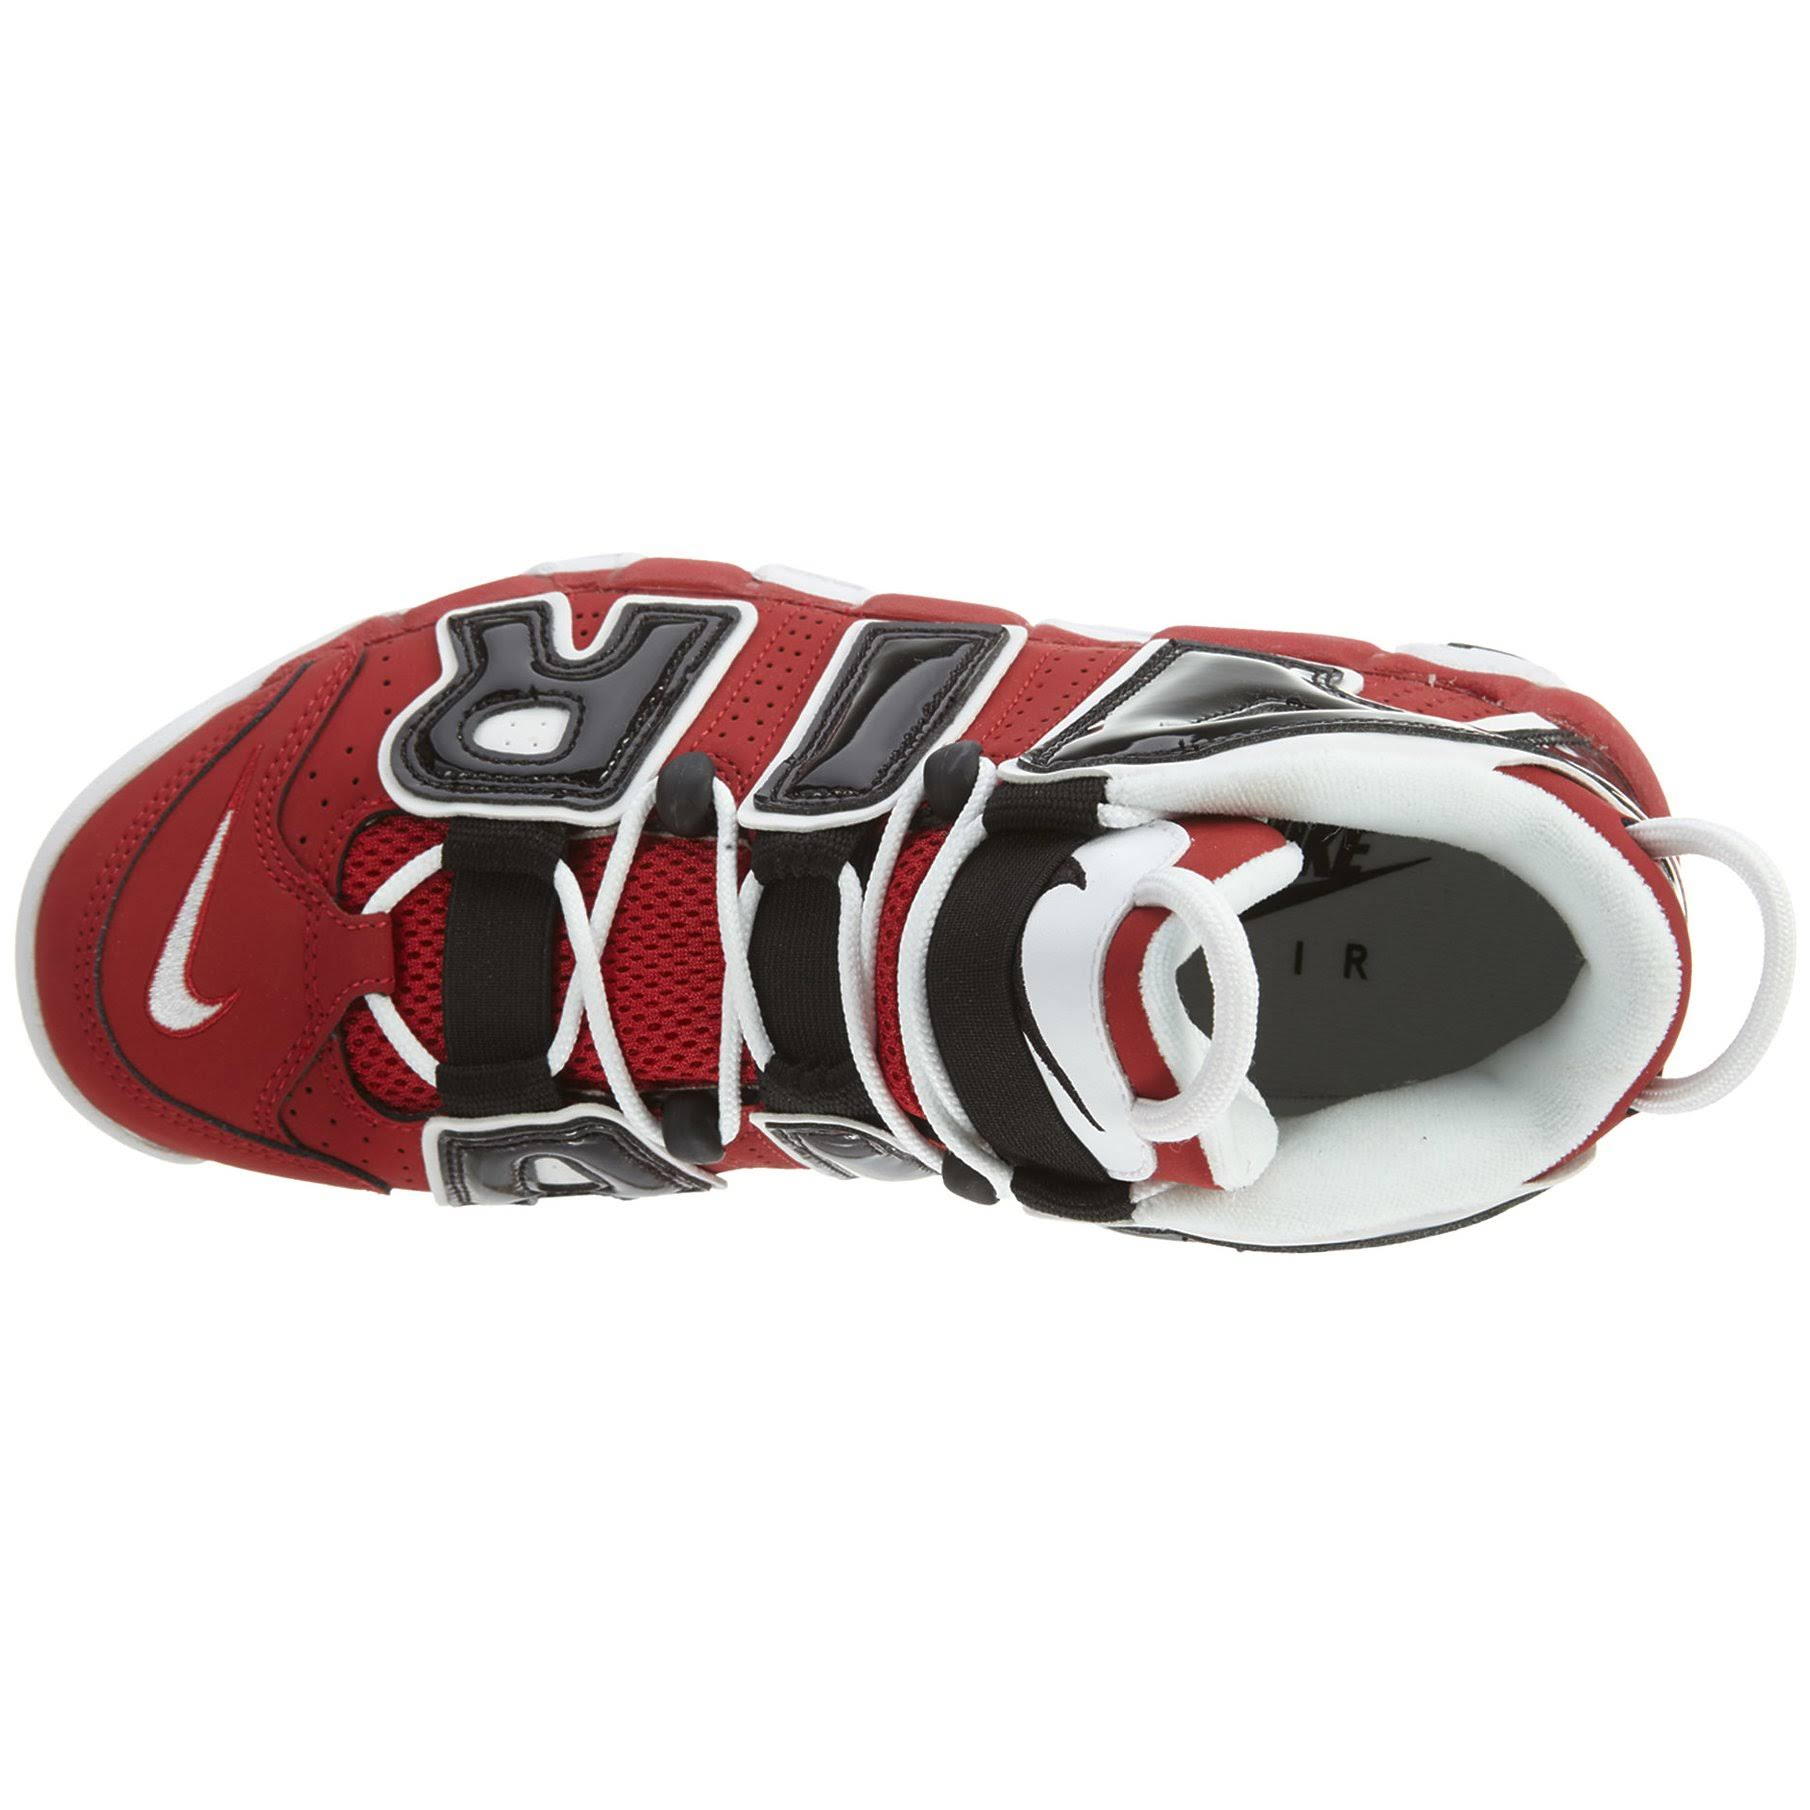 'bulls' Negro Hombre Tamaño Blanco 8 Air Uptempo More Varsity 5 Para Nike De Deporte Rojo Zapatillas cRFTwyYZY